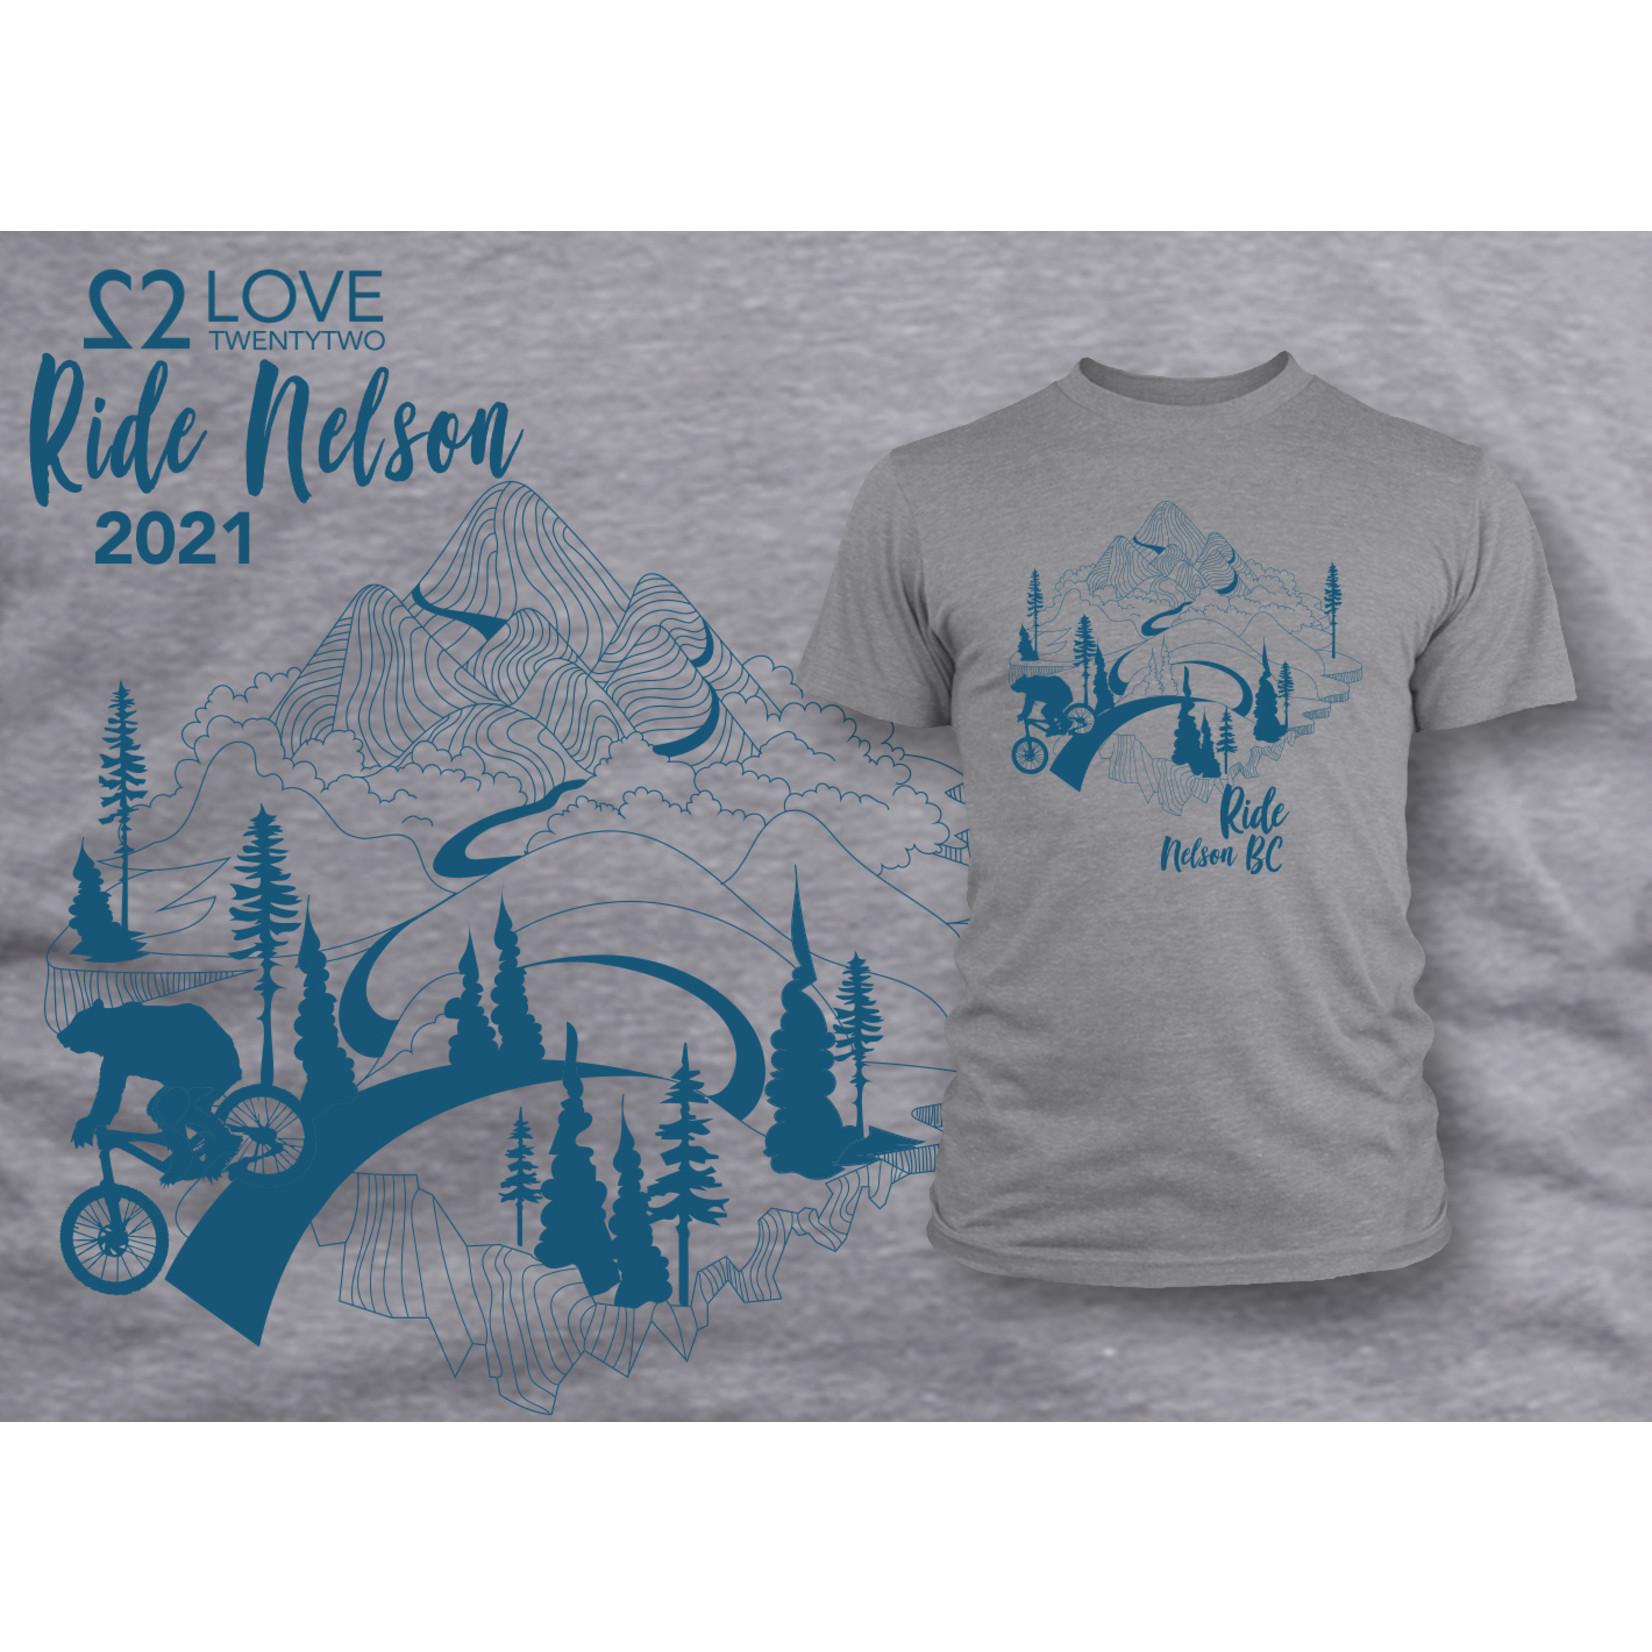 Love TwentyTwo Love 22 Ride Nelson T-Shirt